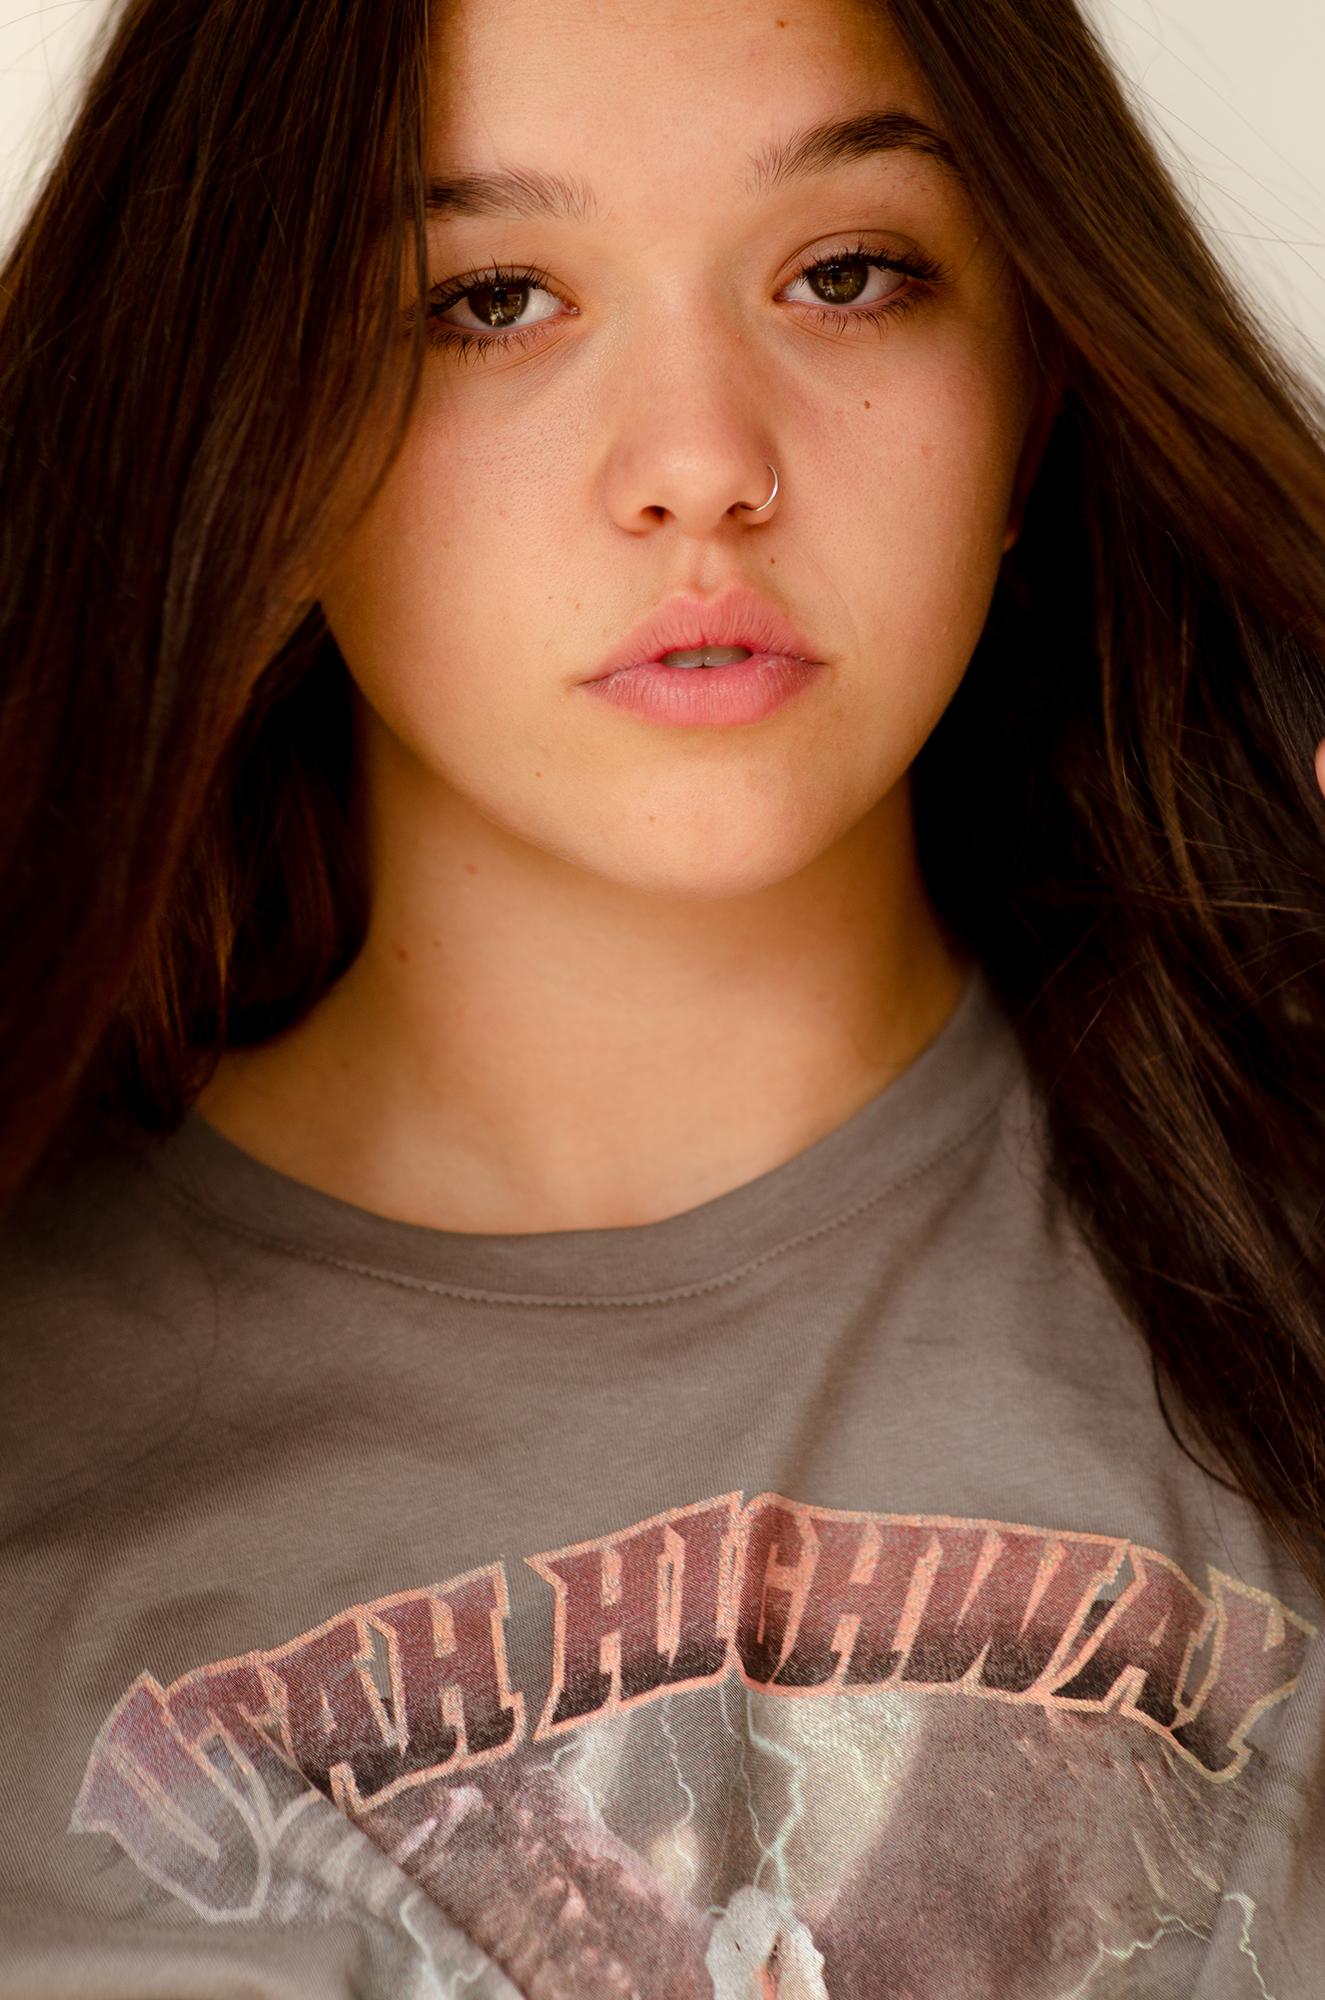 NEUE model Aliyah Sayed-Rich shot by Aaron VIII